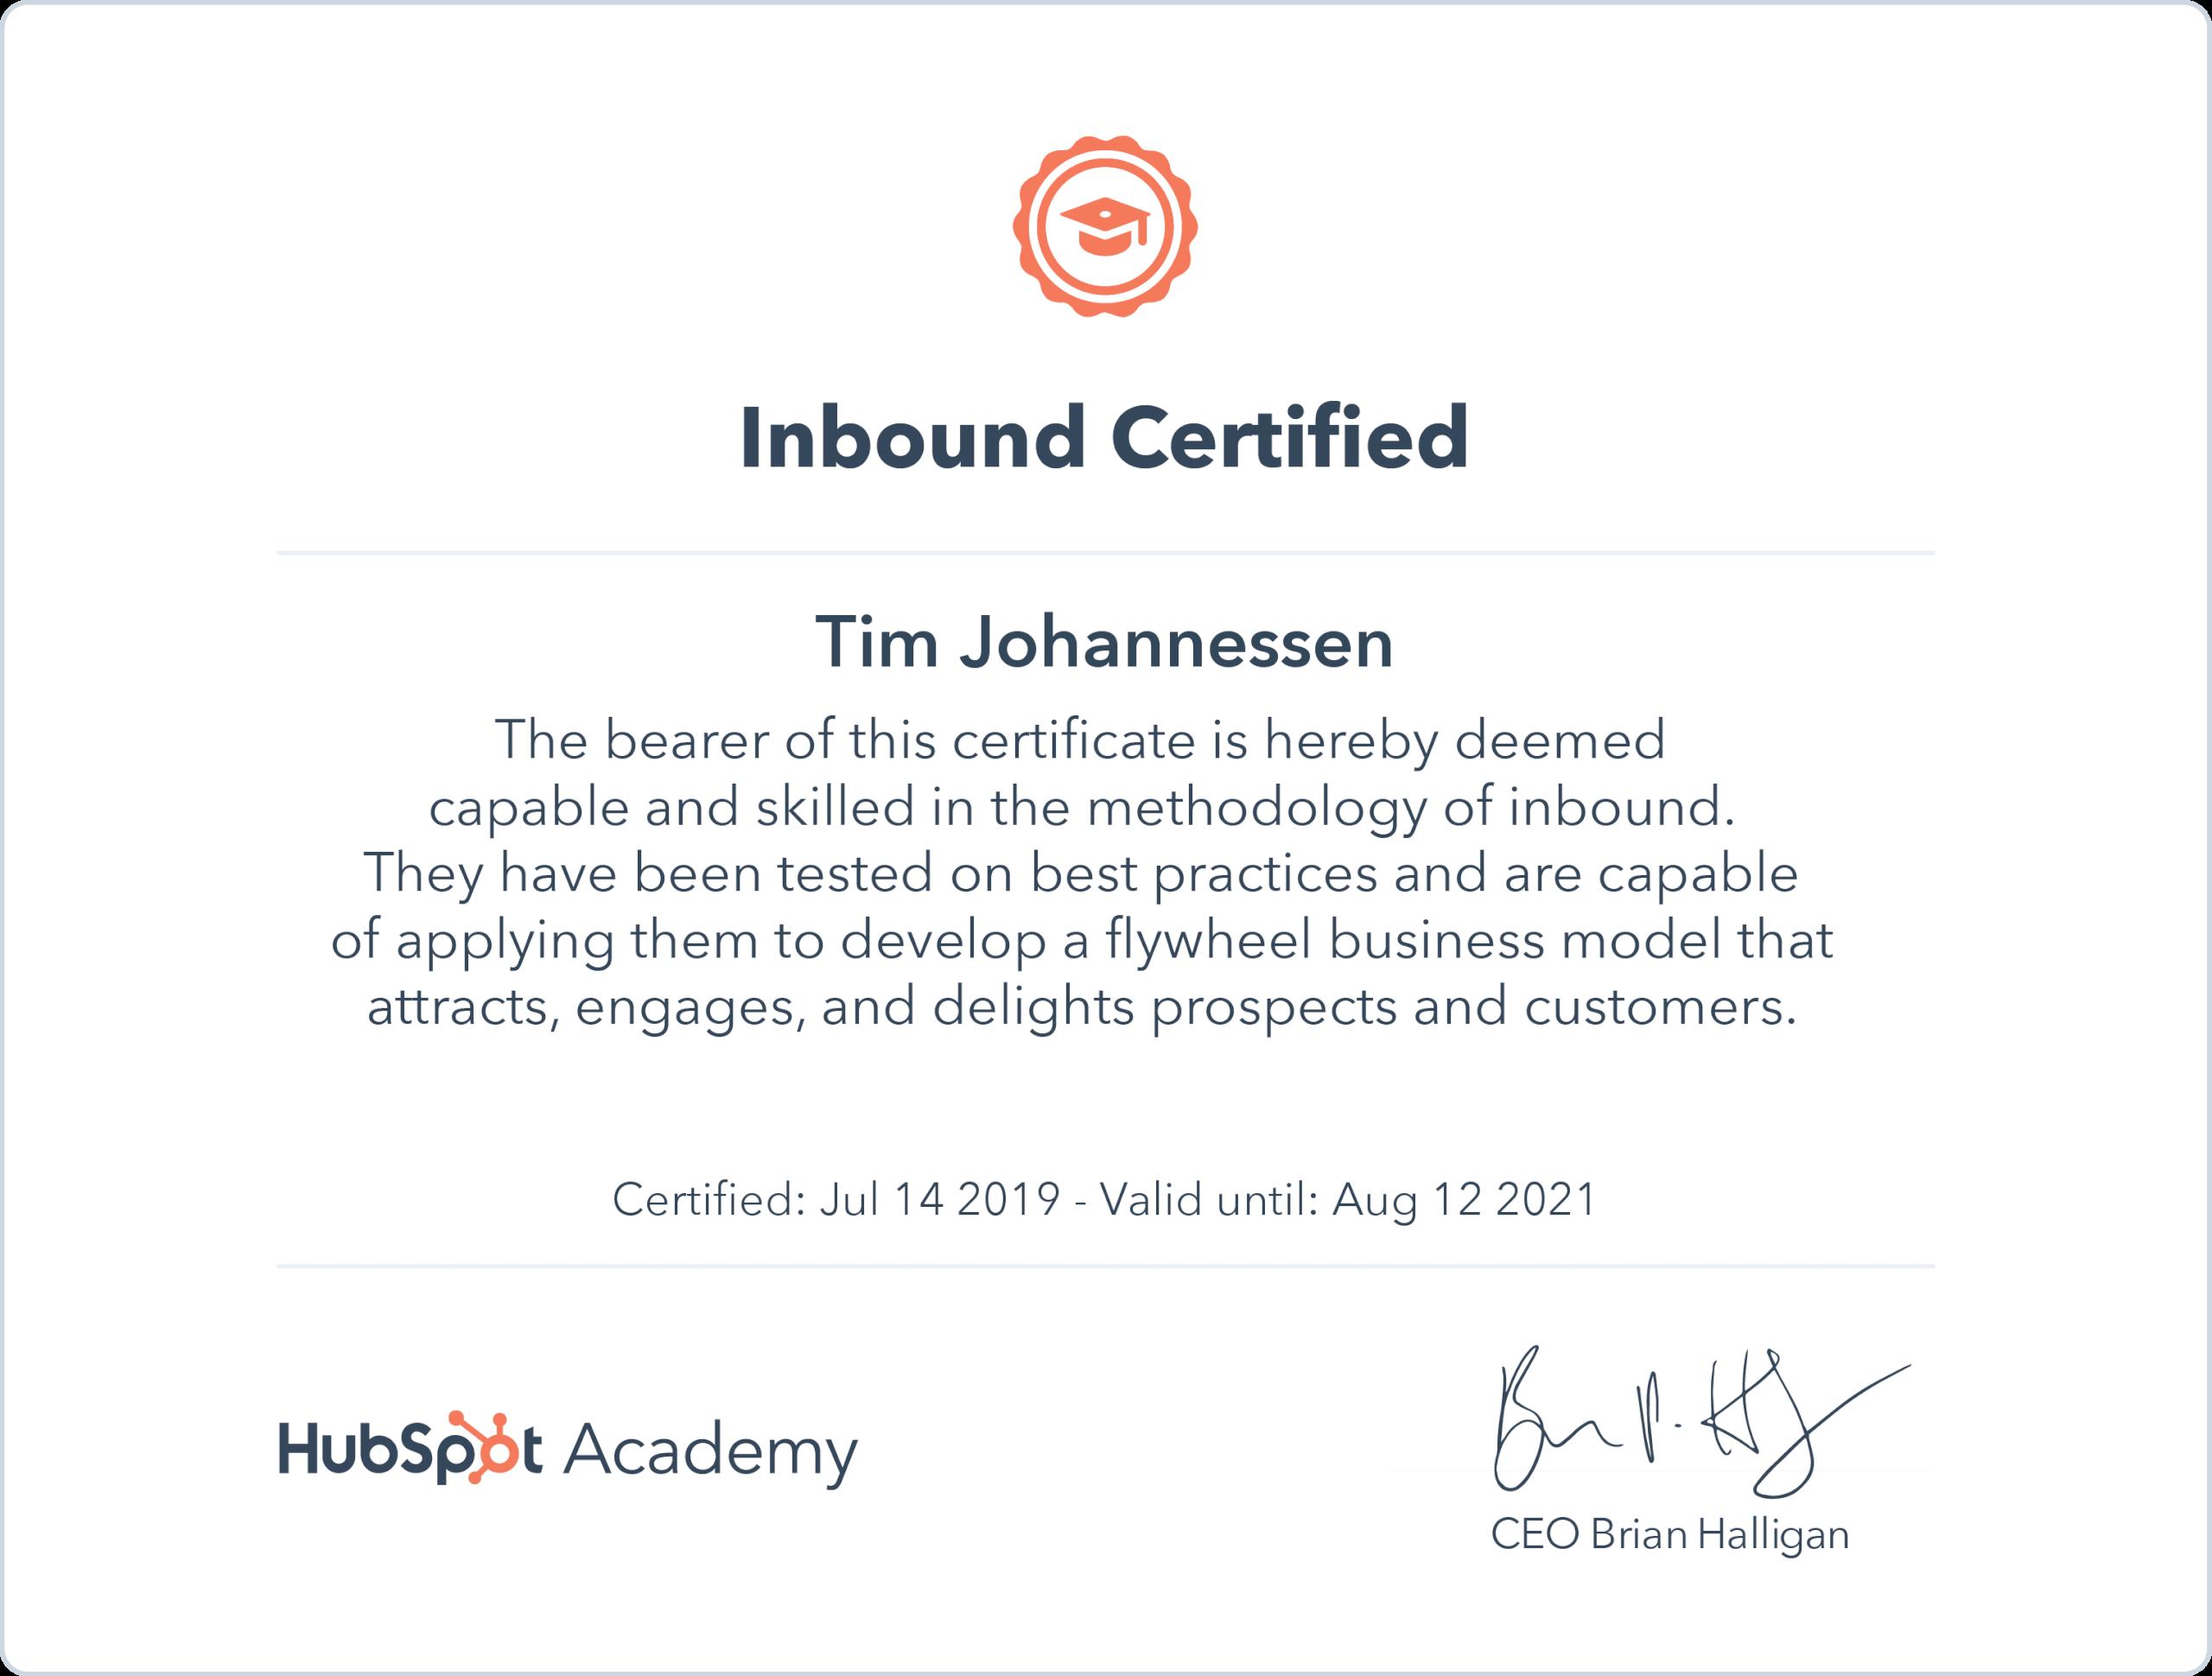 Inbound Certification Hubspot Academy Tim Johannessen